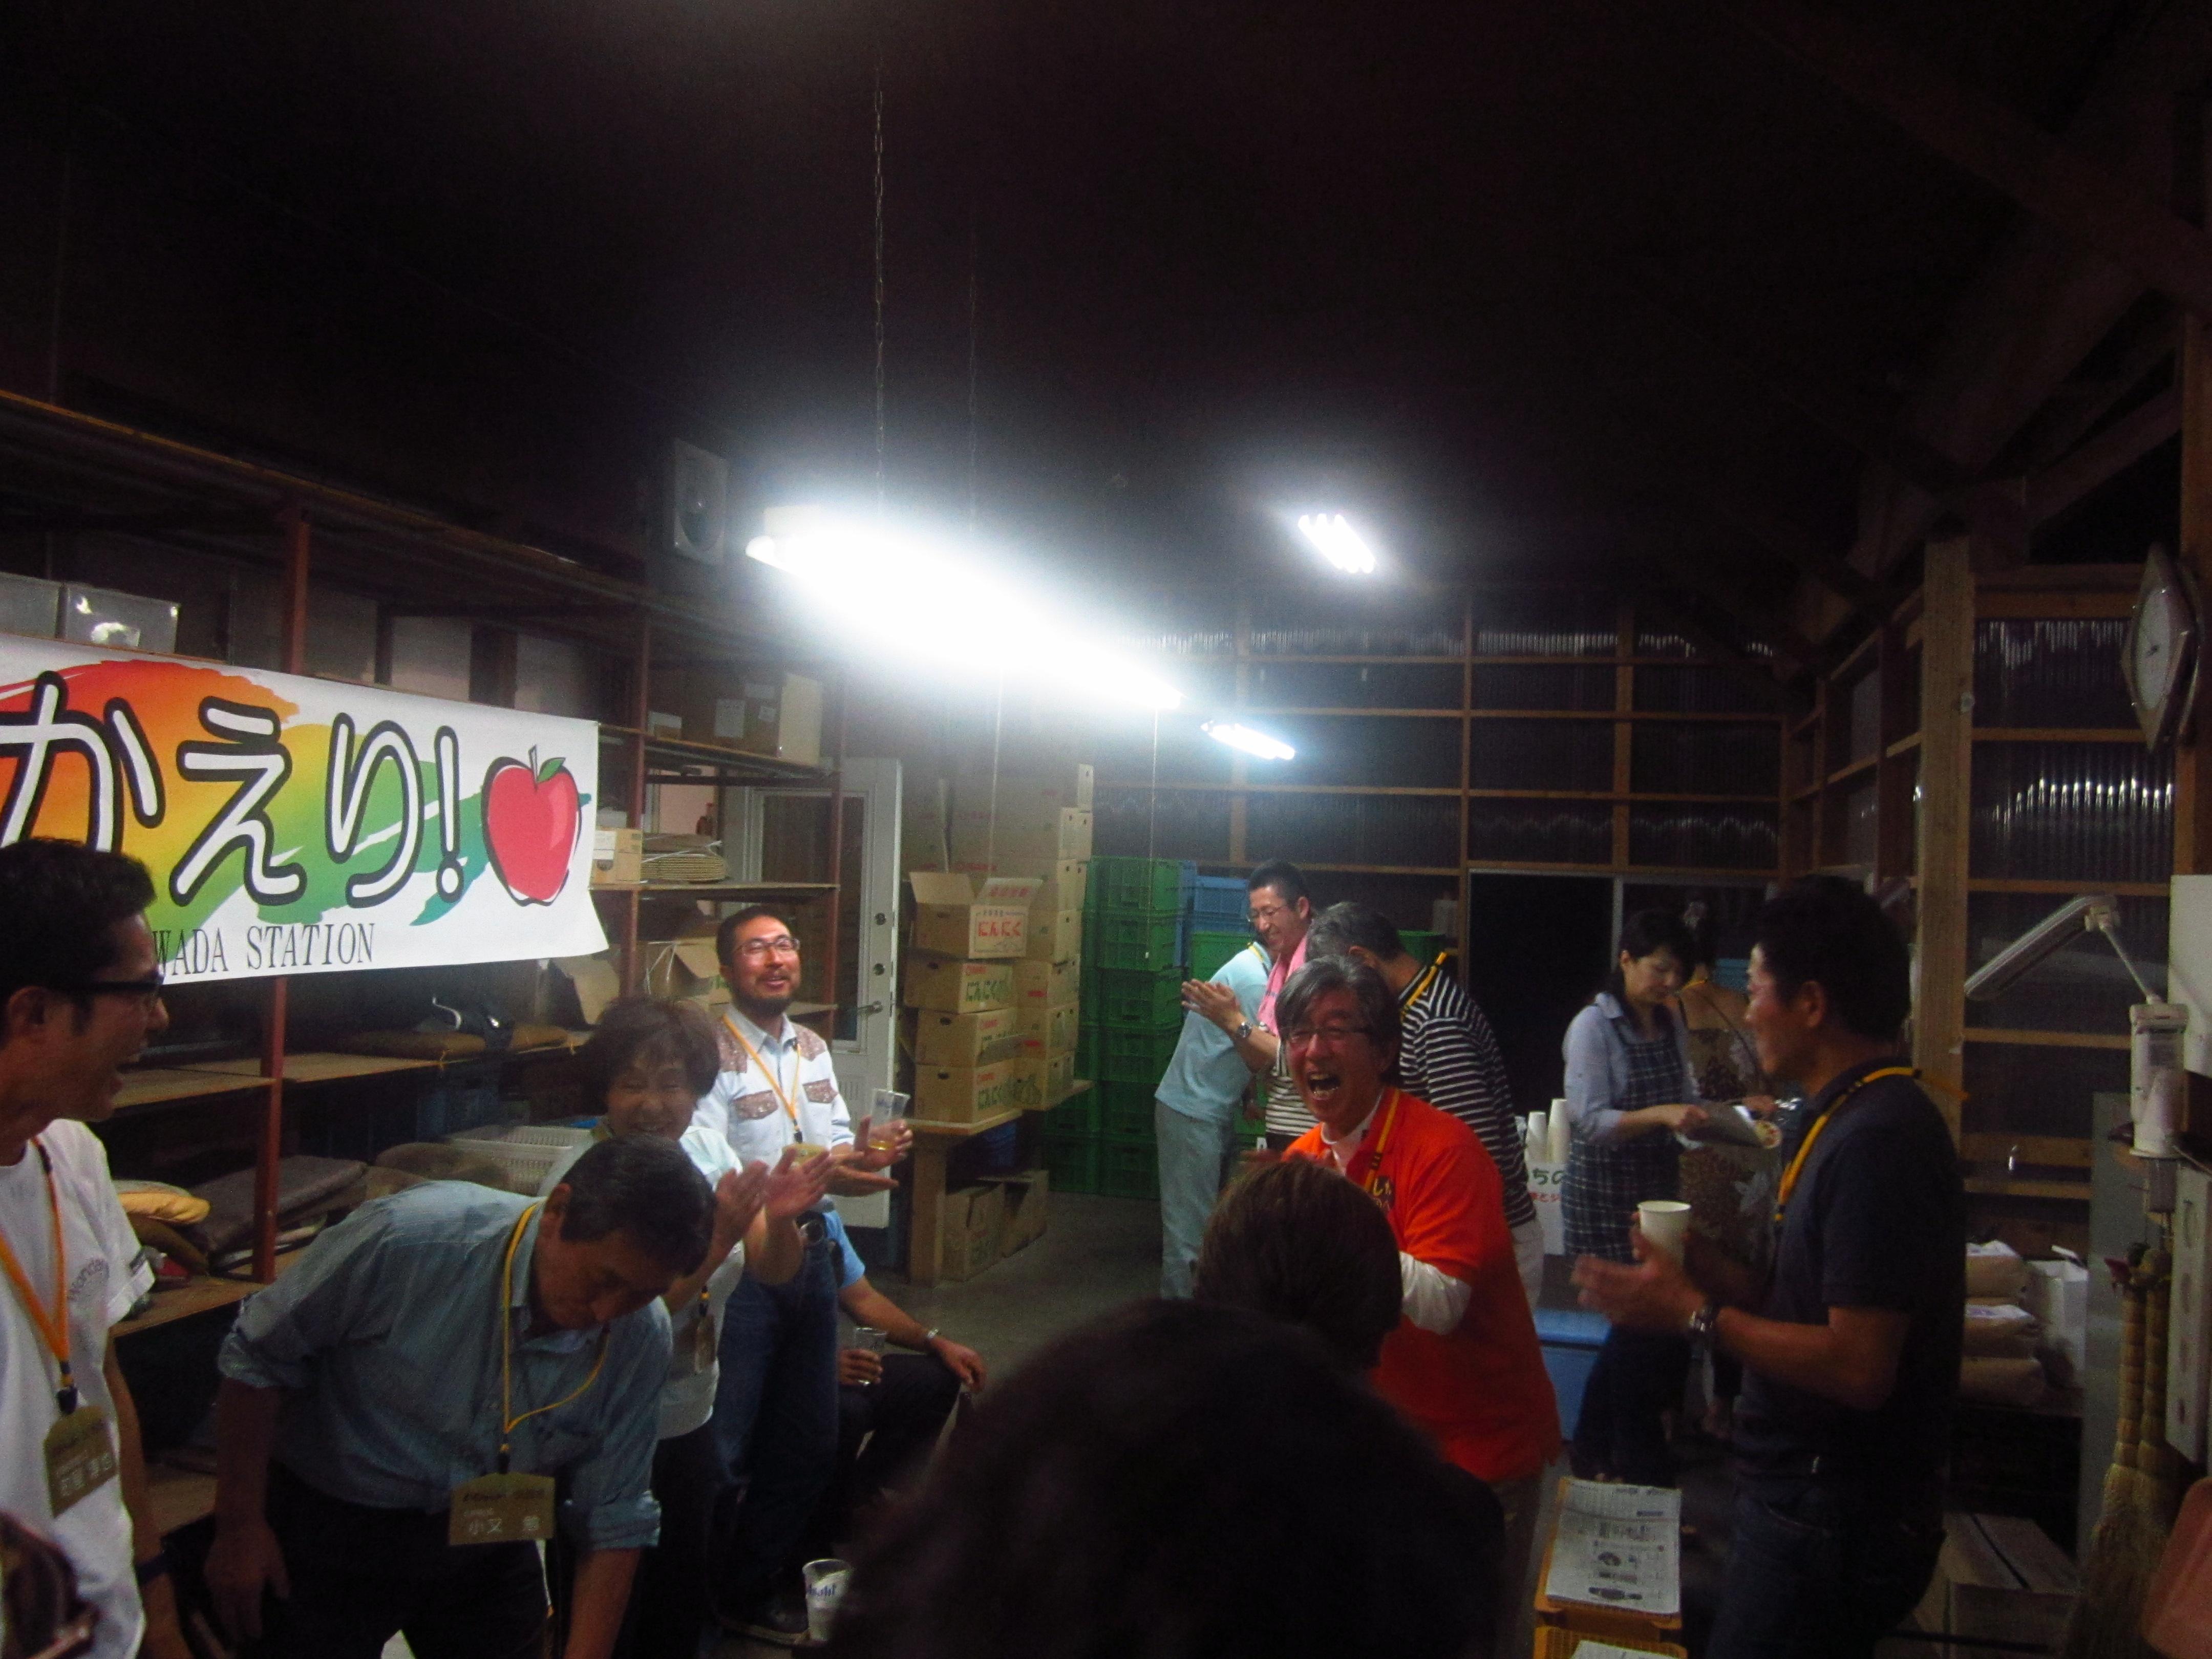 IMG 4445 - 麻布十番納涼祭り25,26日(七戸町出店)